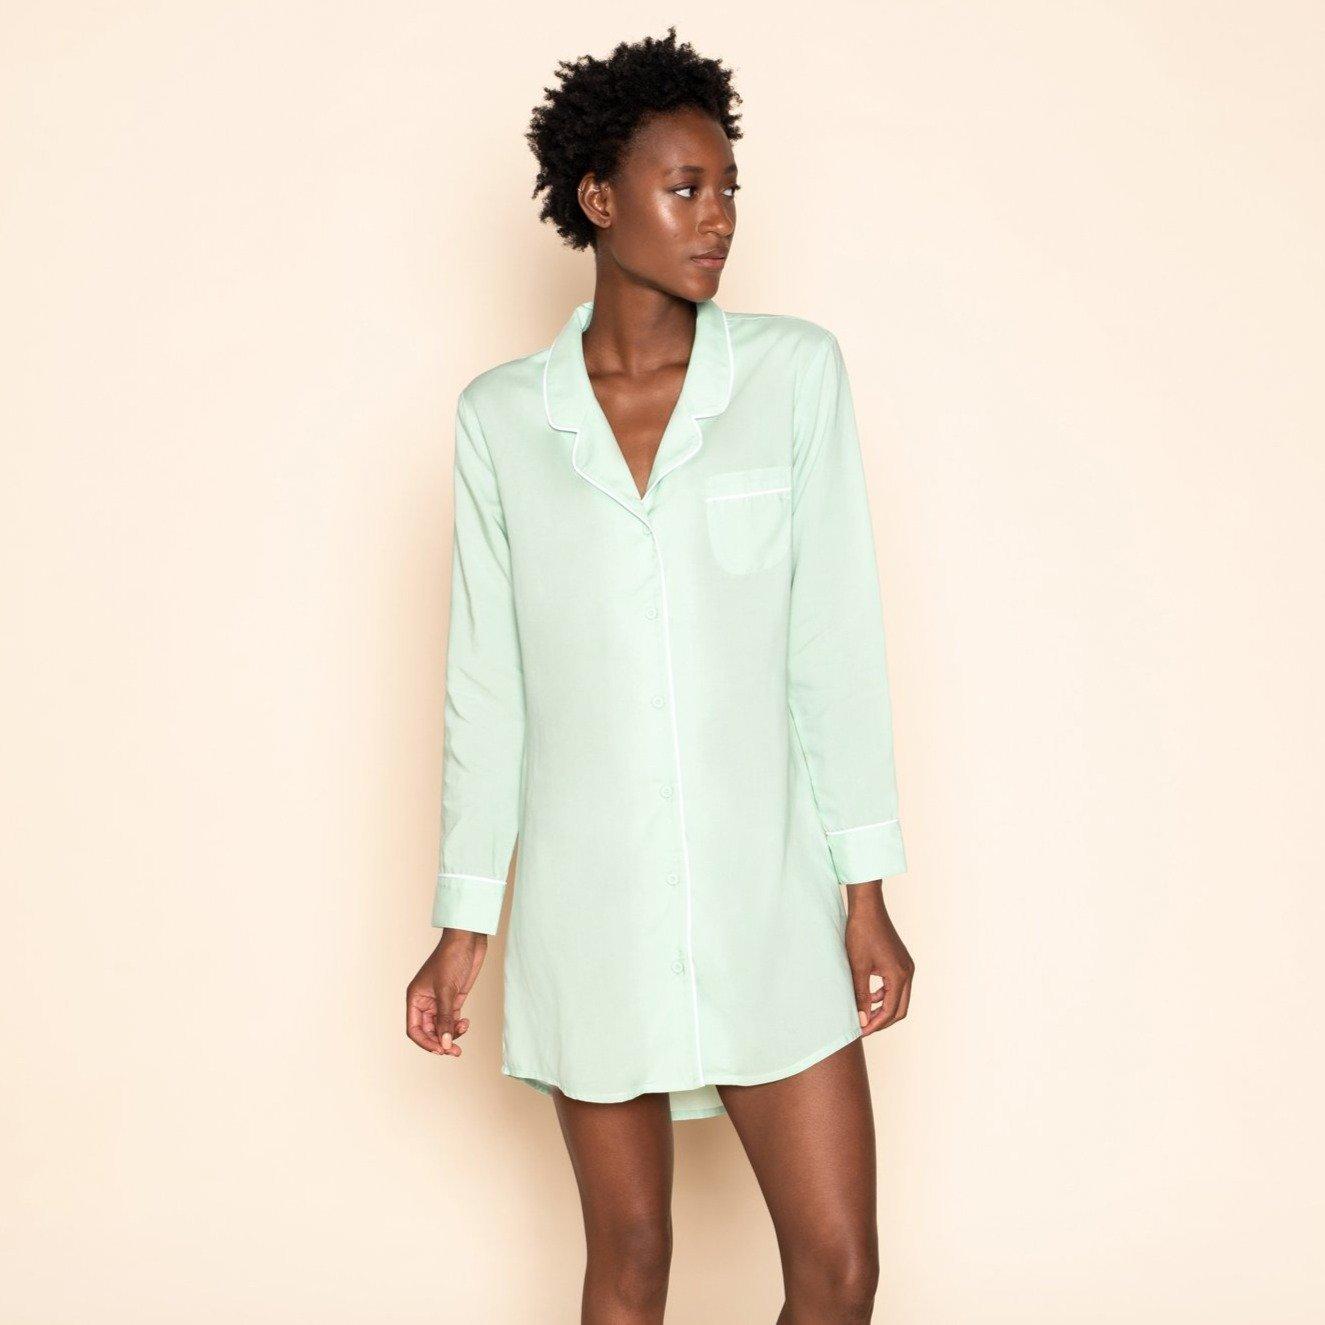 Dress Blouse Mint Green